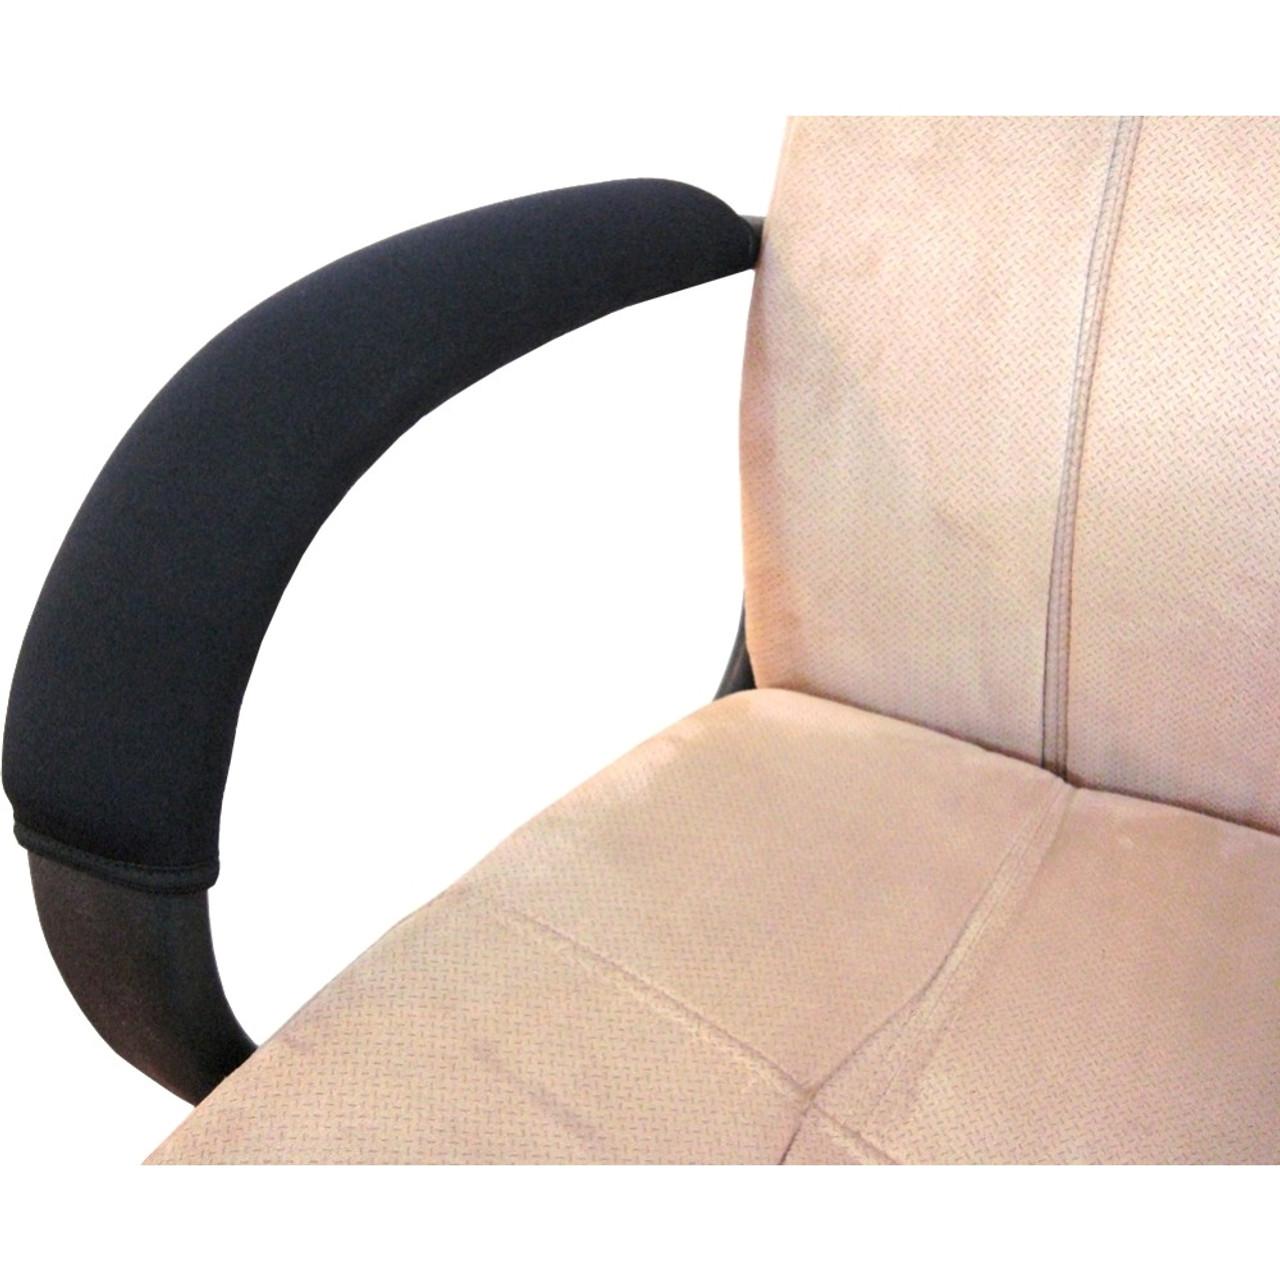 Office Chair Armrest office chair armrest covers ...